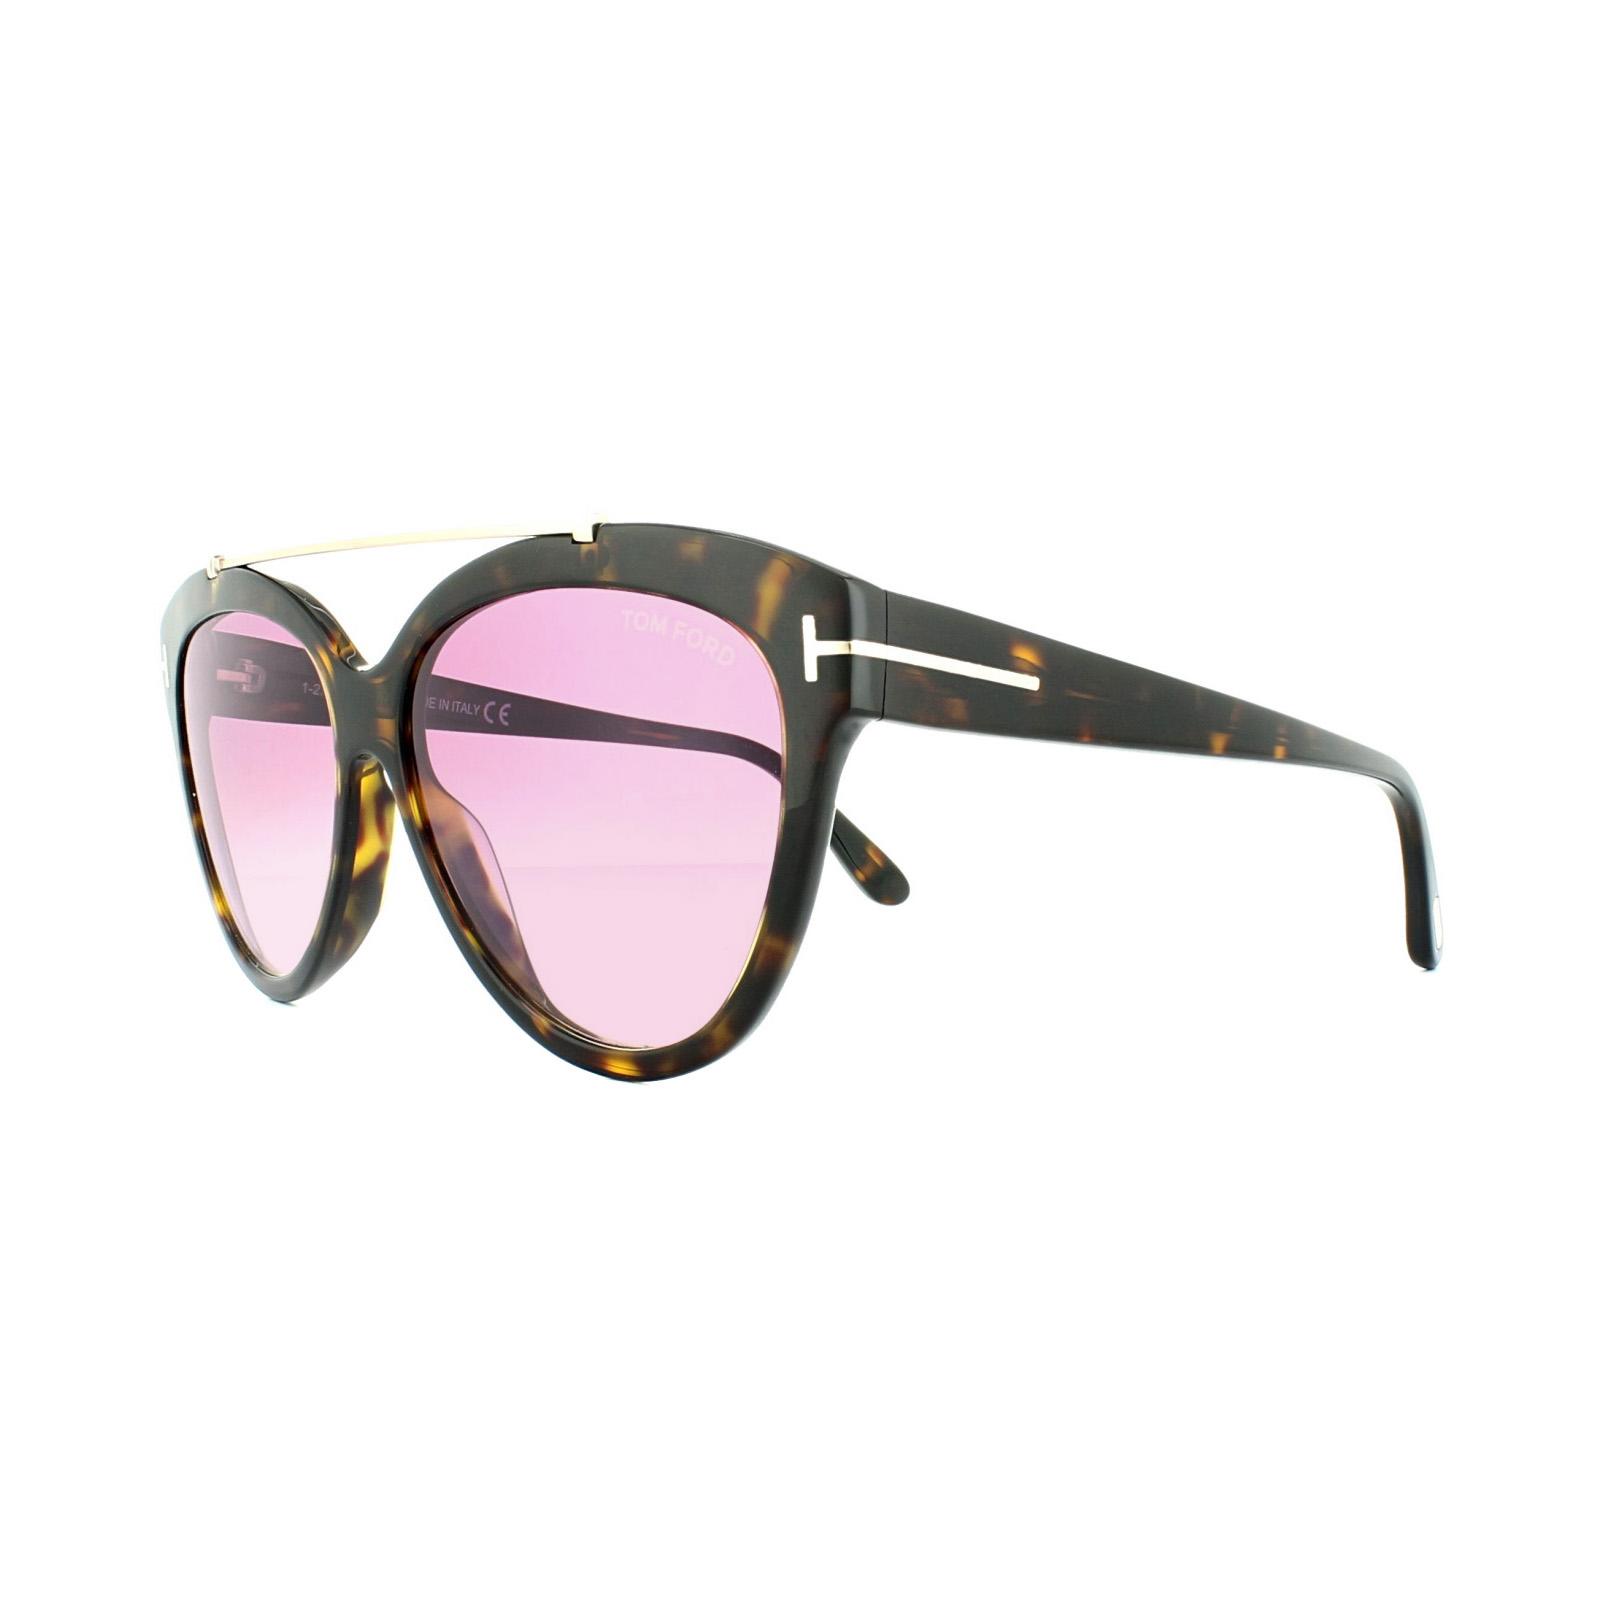 9af6a2b635a2 Details about Tom Ford Sunglasses 0518 Livia 52Z Dark Havana Gradient  Mirror Violet